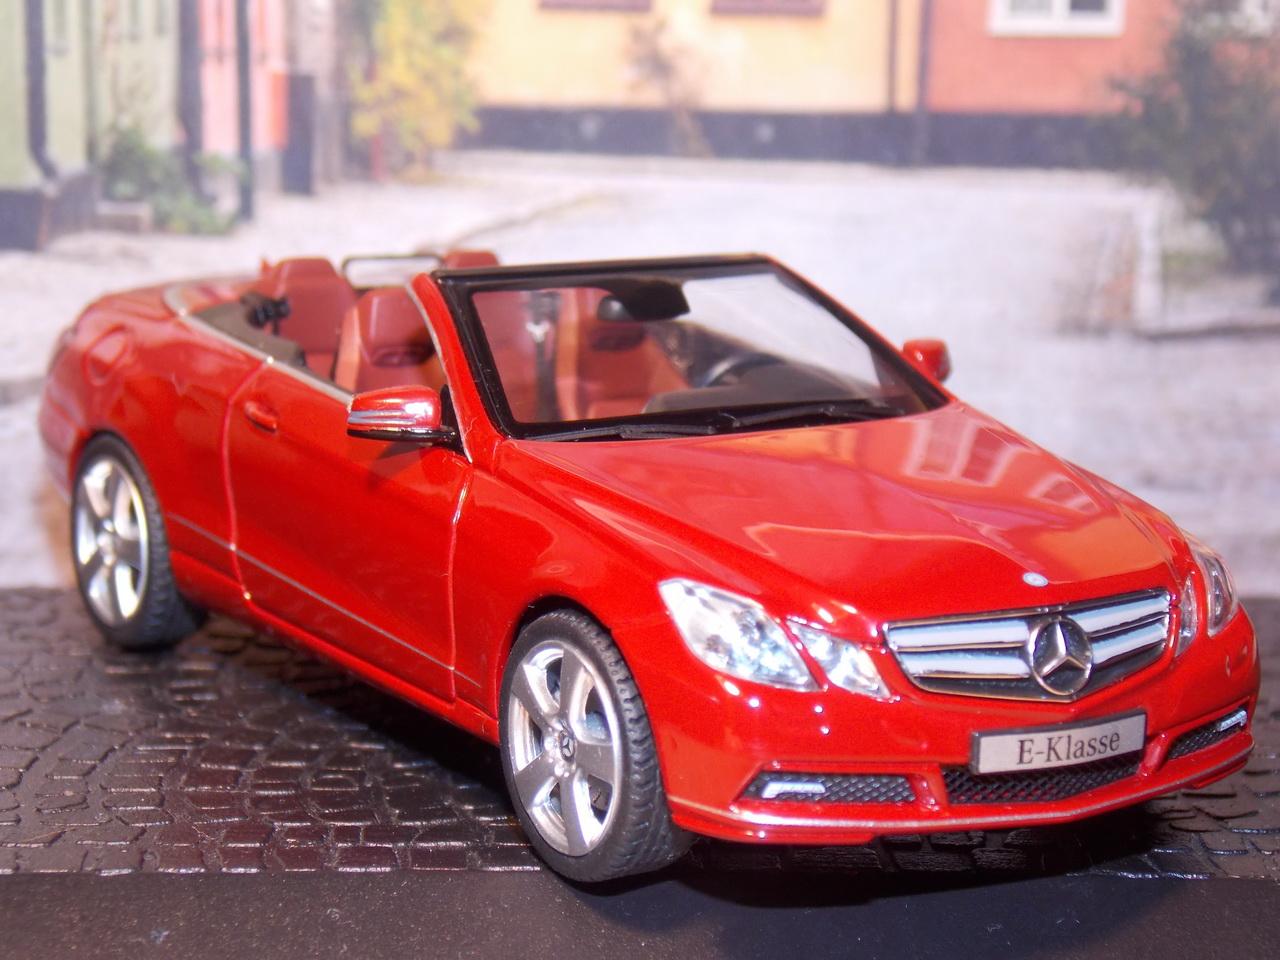 Mercedes Benz E-Class Cabriolet – 2009